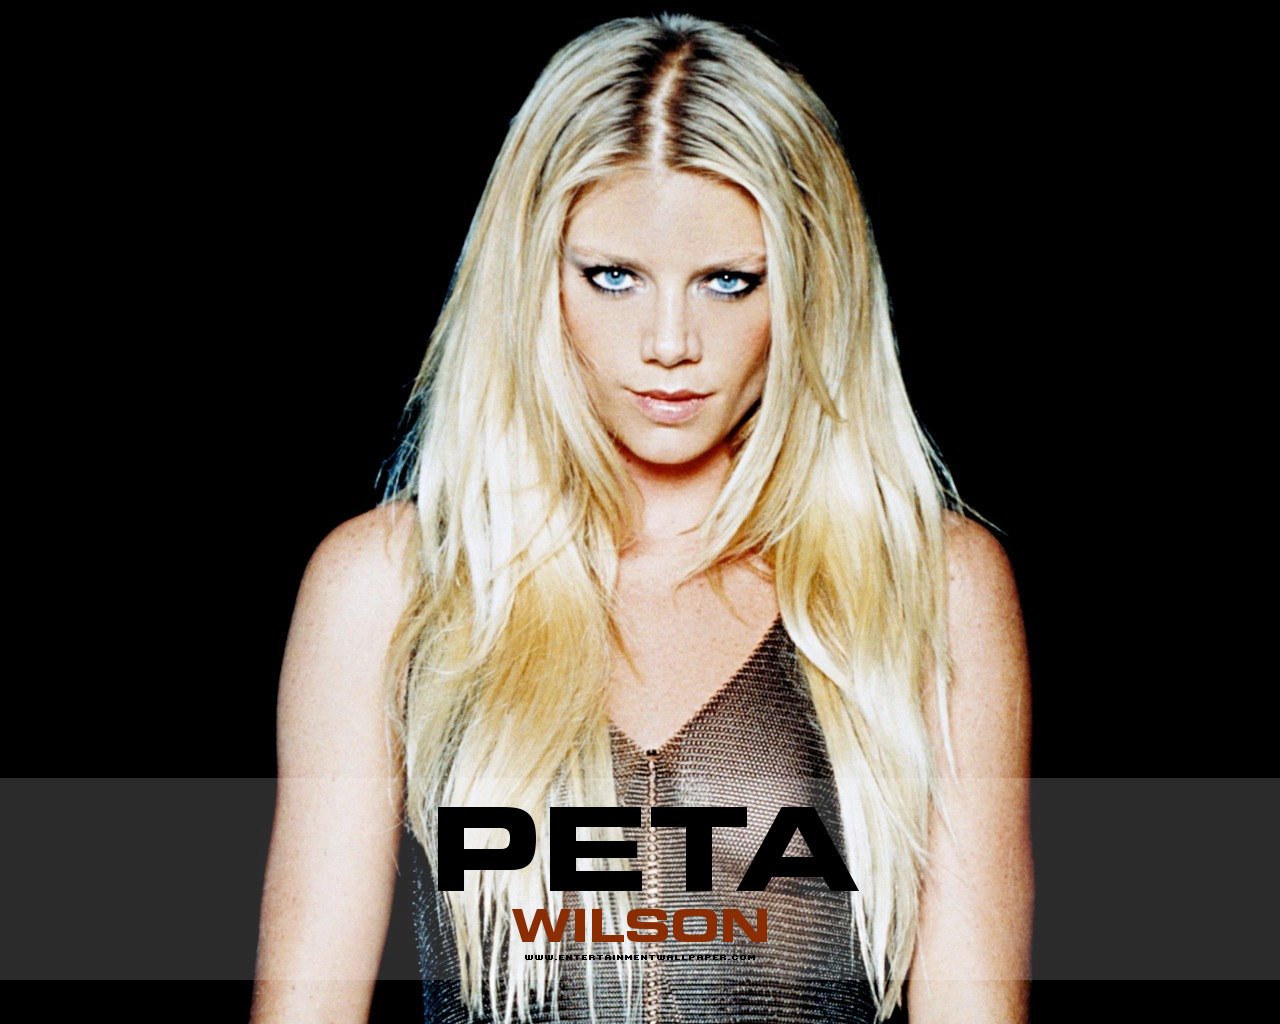 Peta Wilson [La Femme Nikita] | FEMALE CELEBRITY